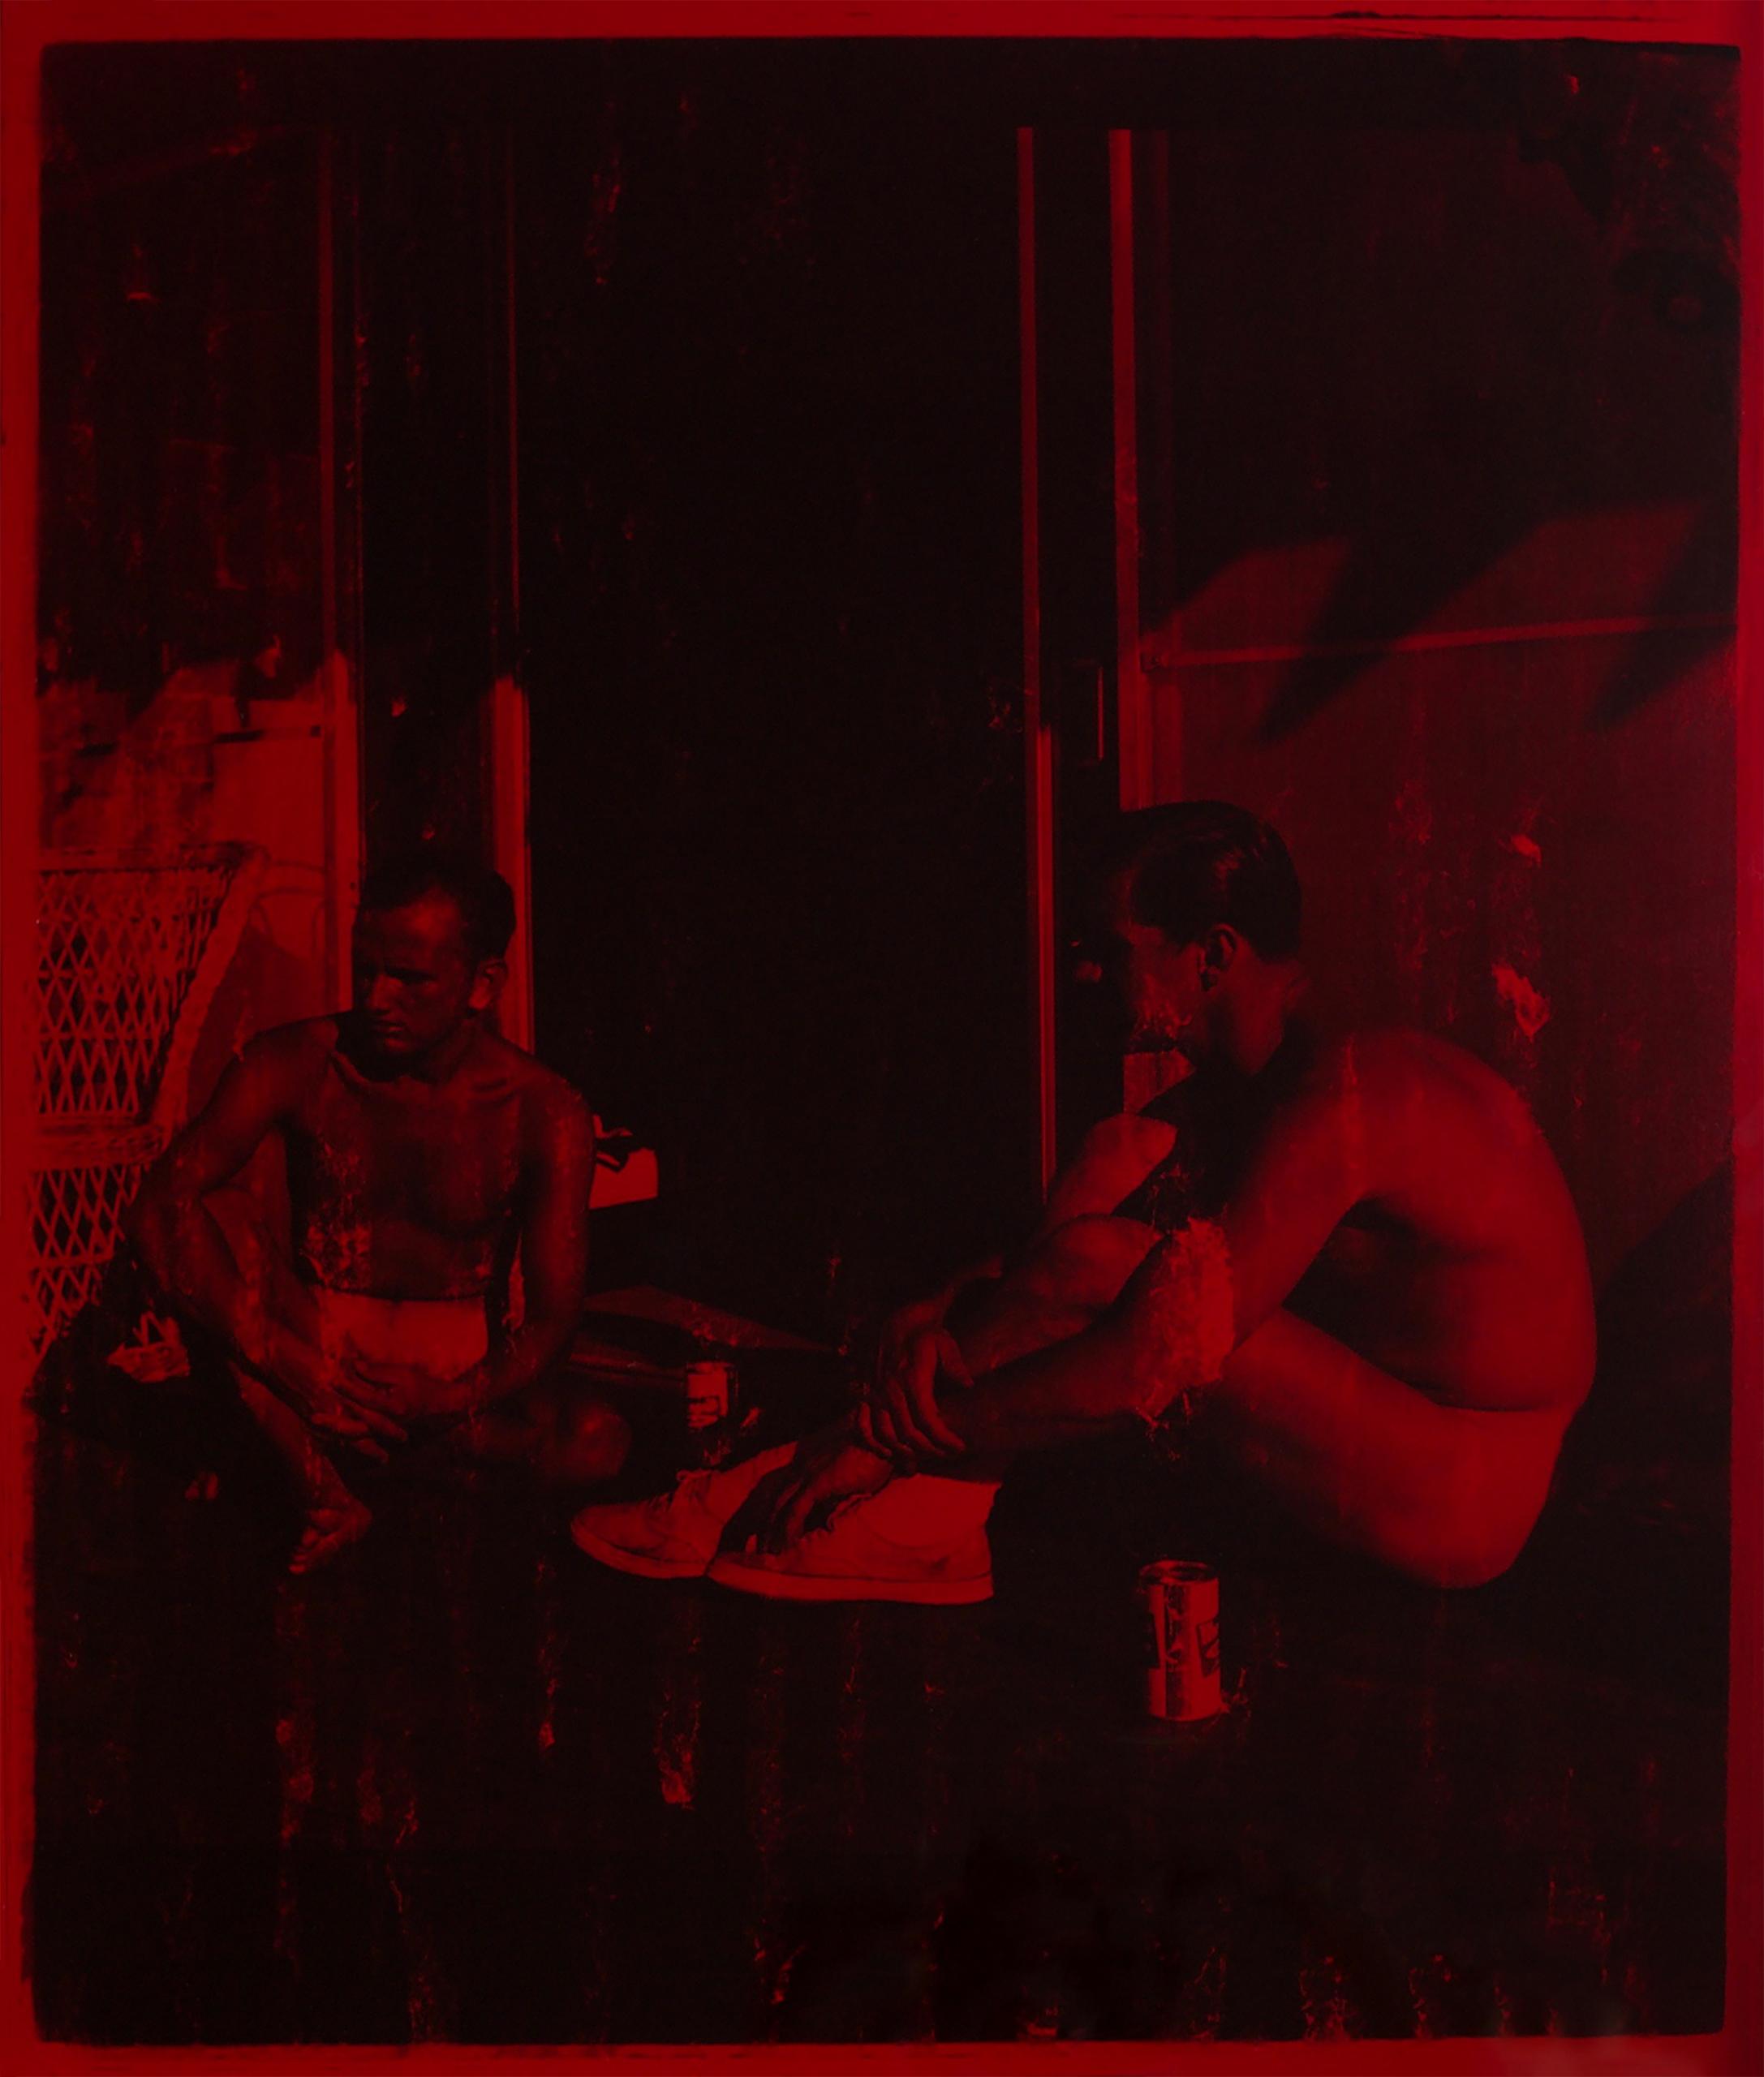 Jonah Samson, Untitled, 2019. Silver gelatin photograph in custom red plexiglass box.